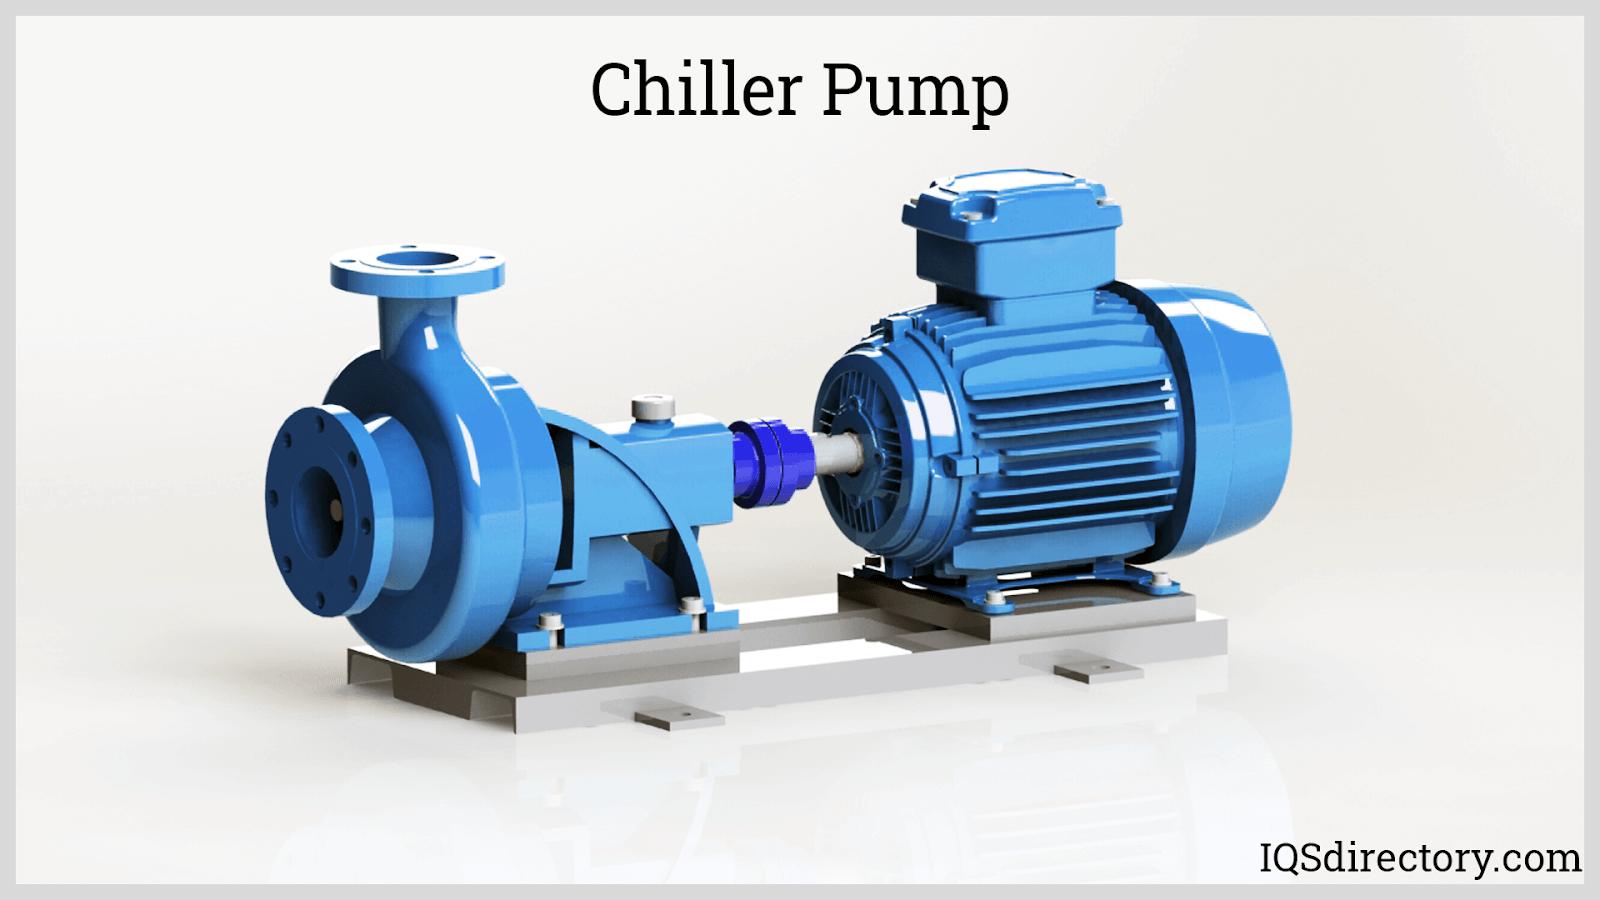 Chiller Pump